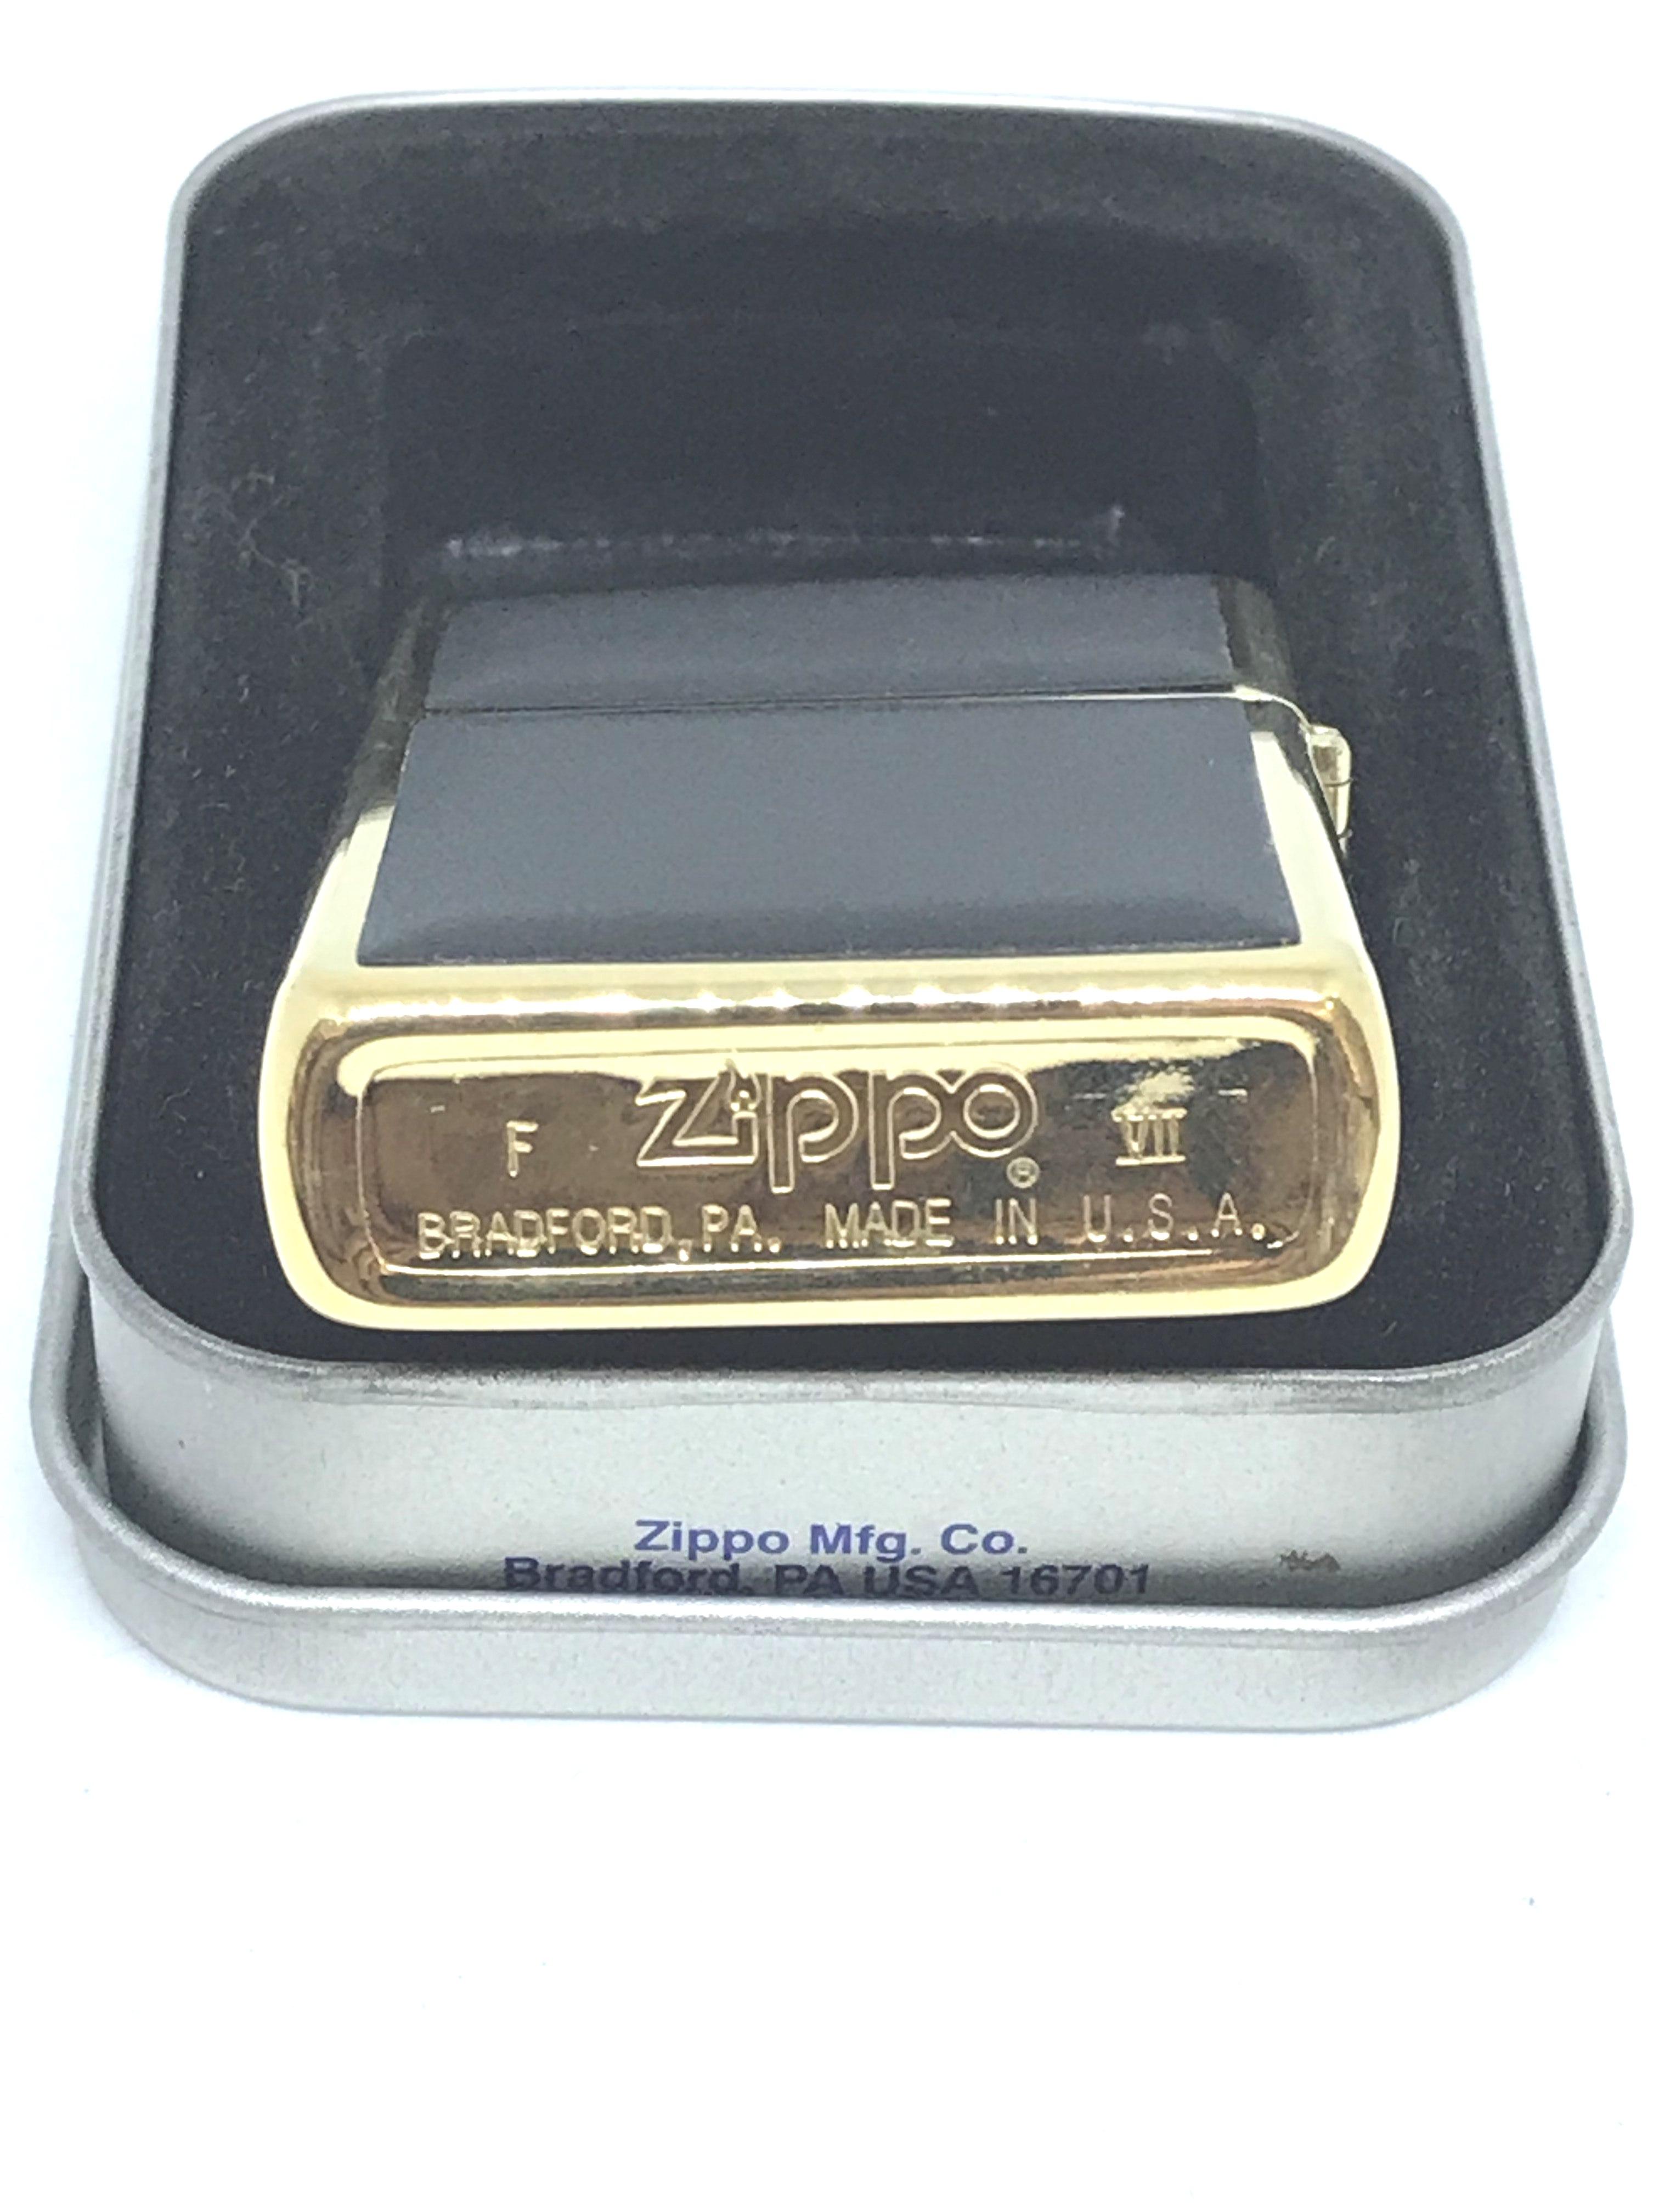 Zippo co bong ma vang mica zippo doi VII NTZ584 2